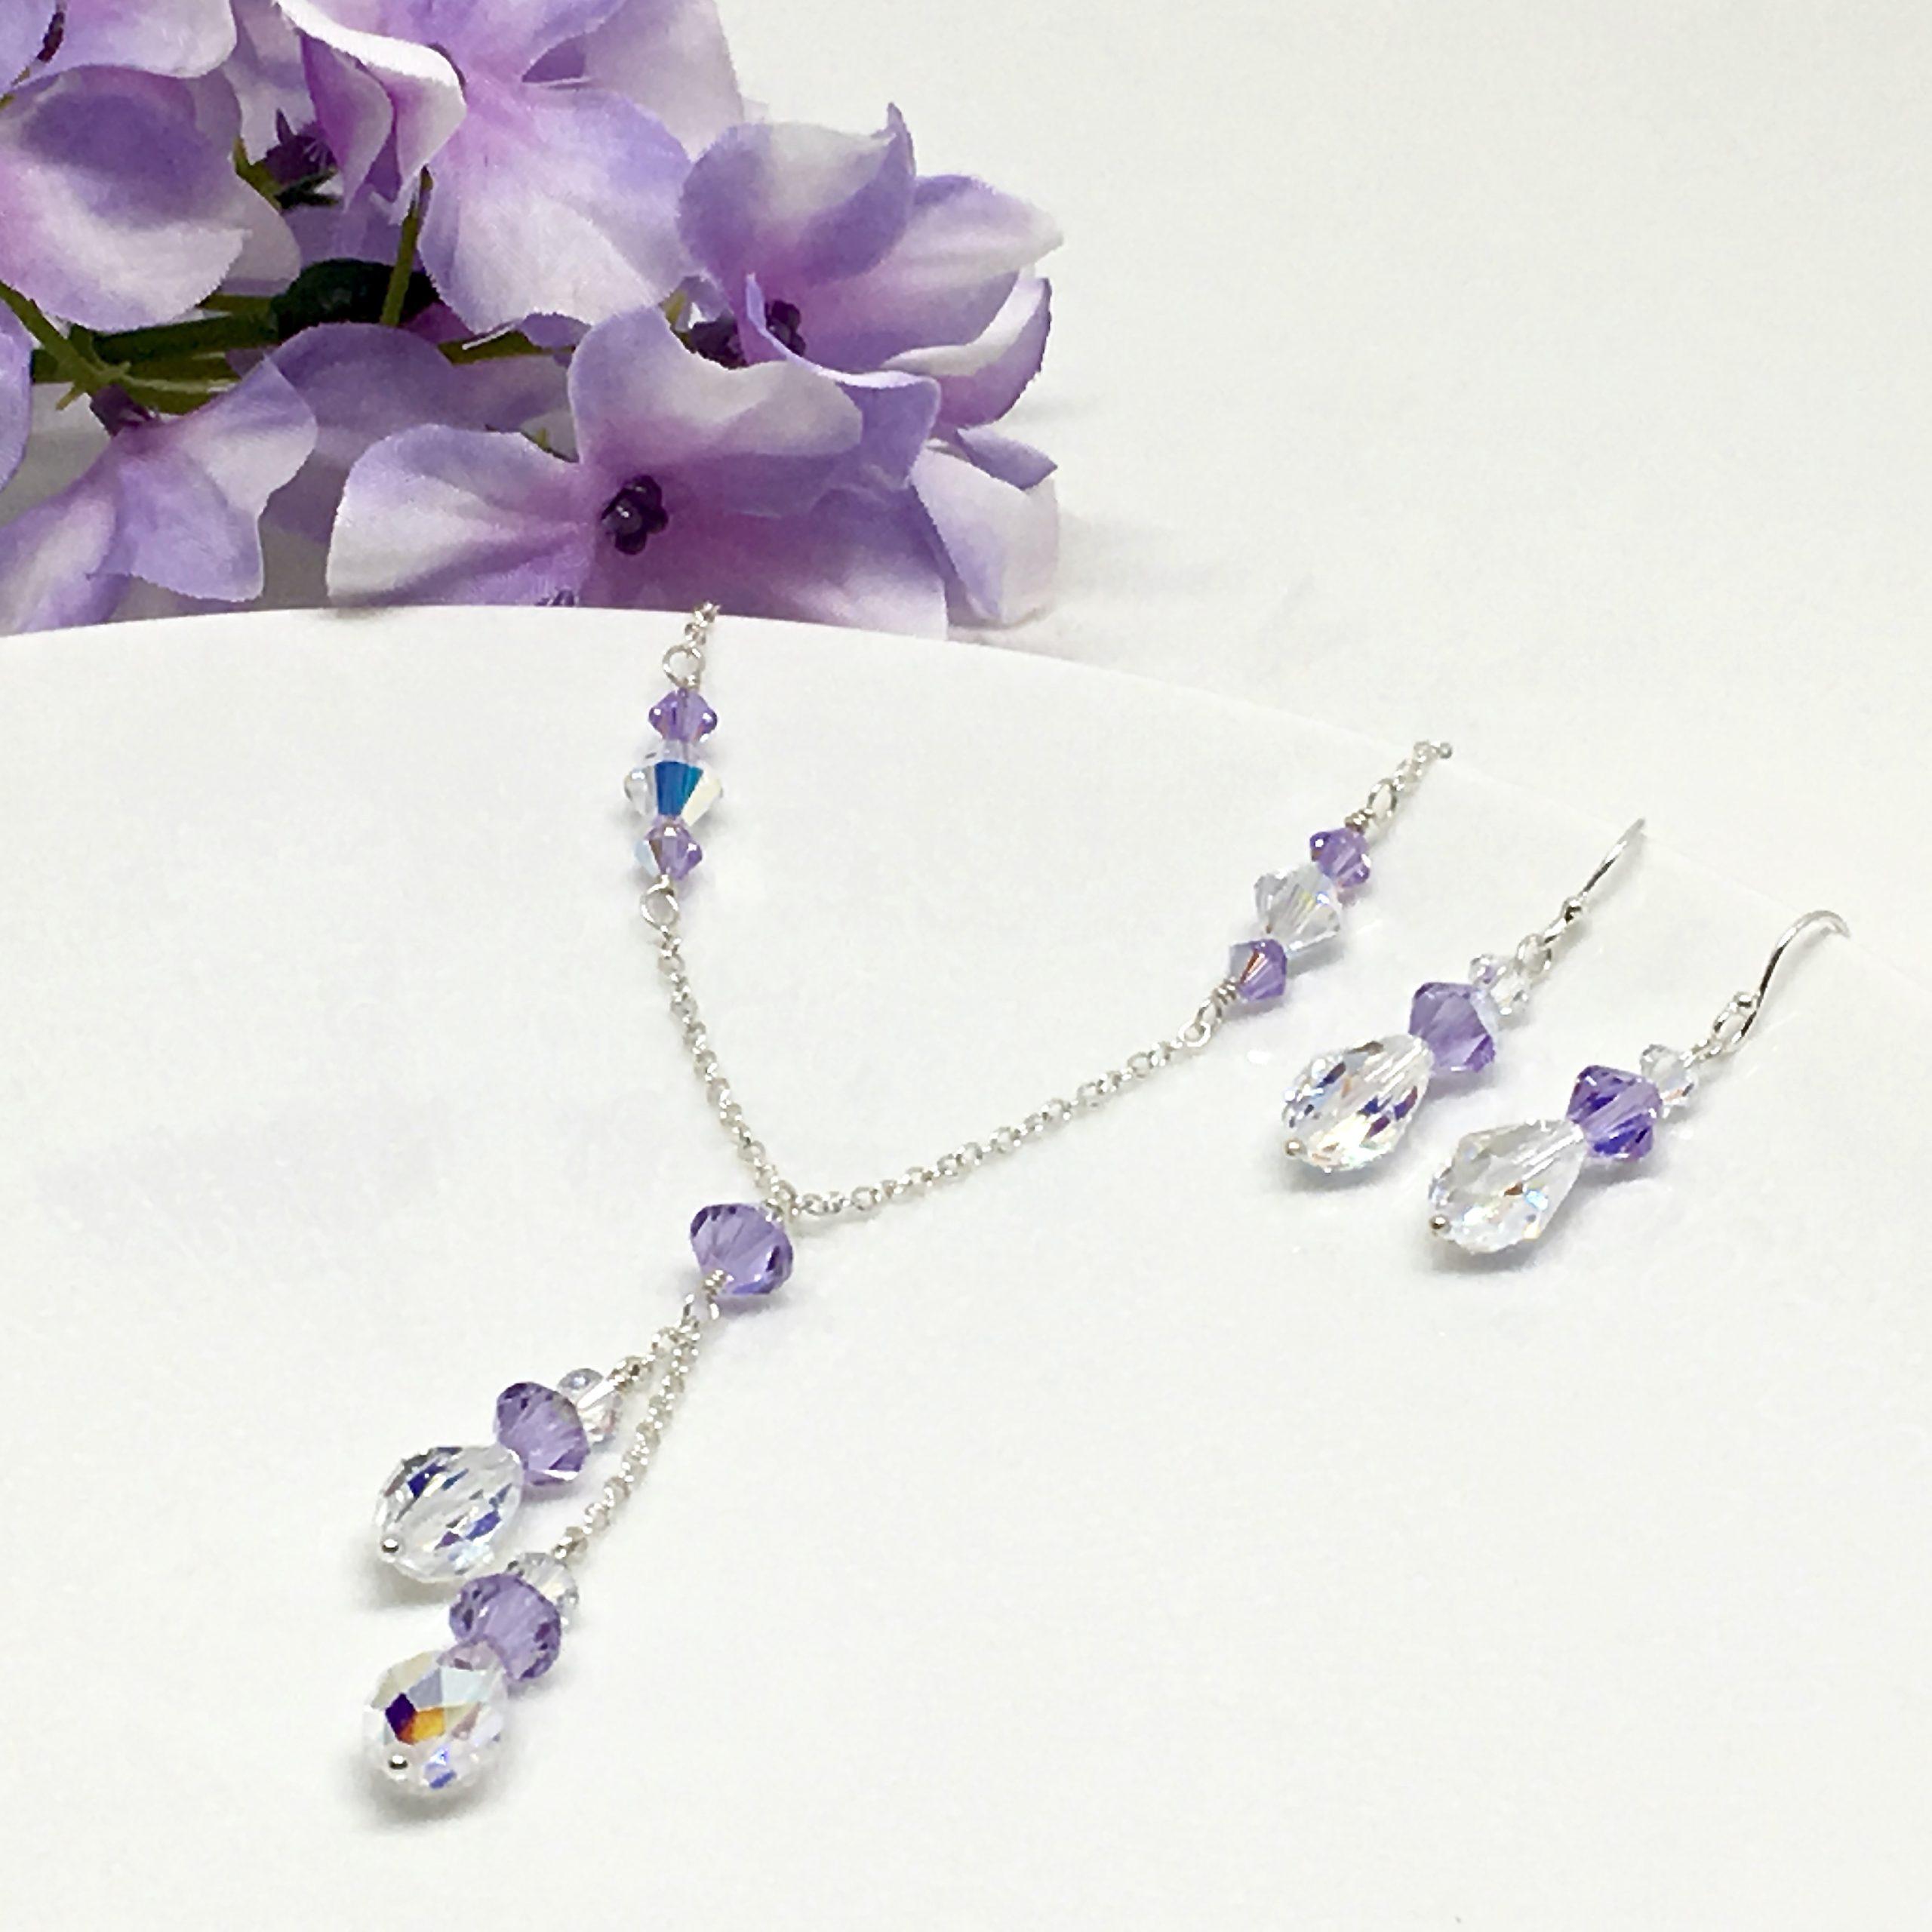 Violet Jewelry Lariat Necklace